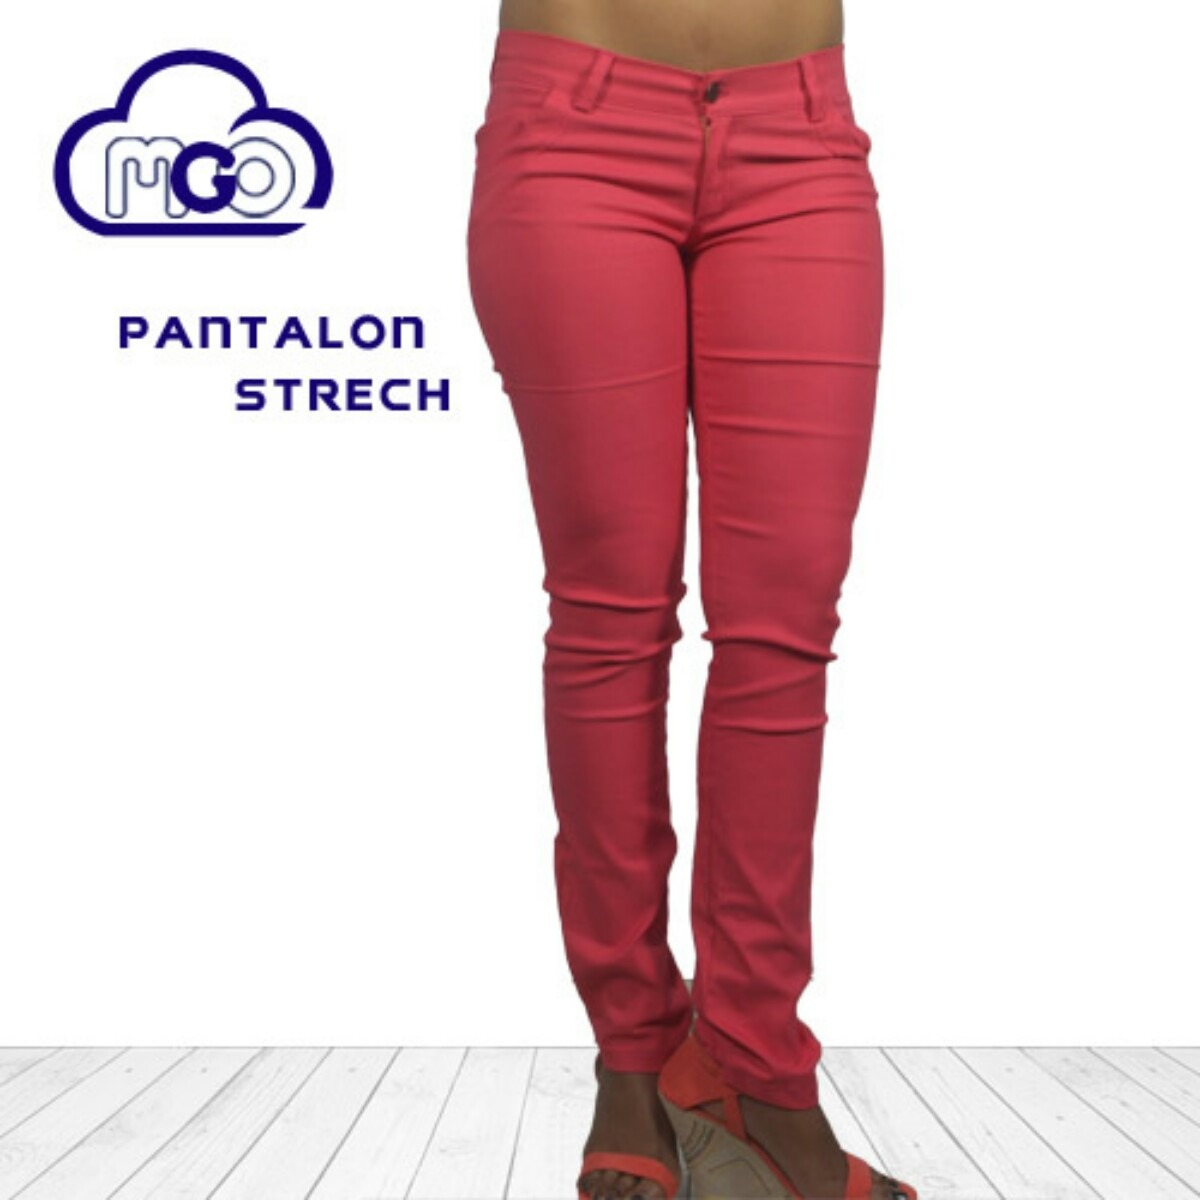 Pantalón Dama Jeans Strech De Colores Mgo Originales - Bs. 3.600,00 ...